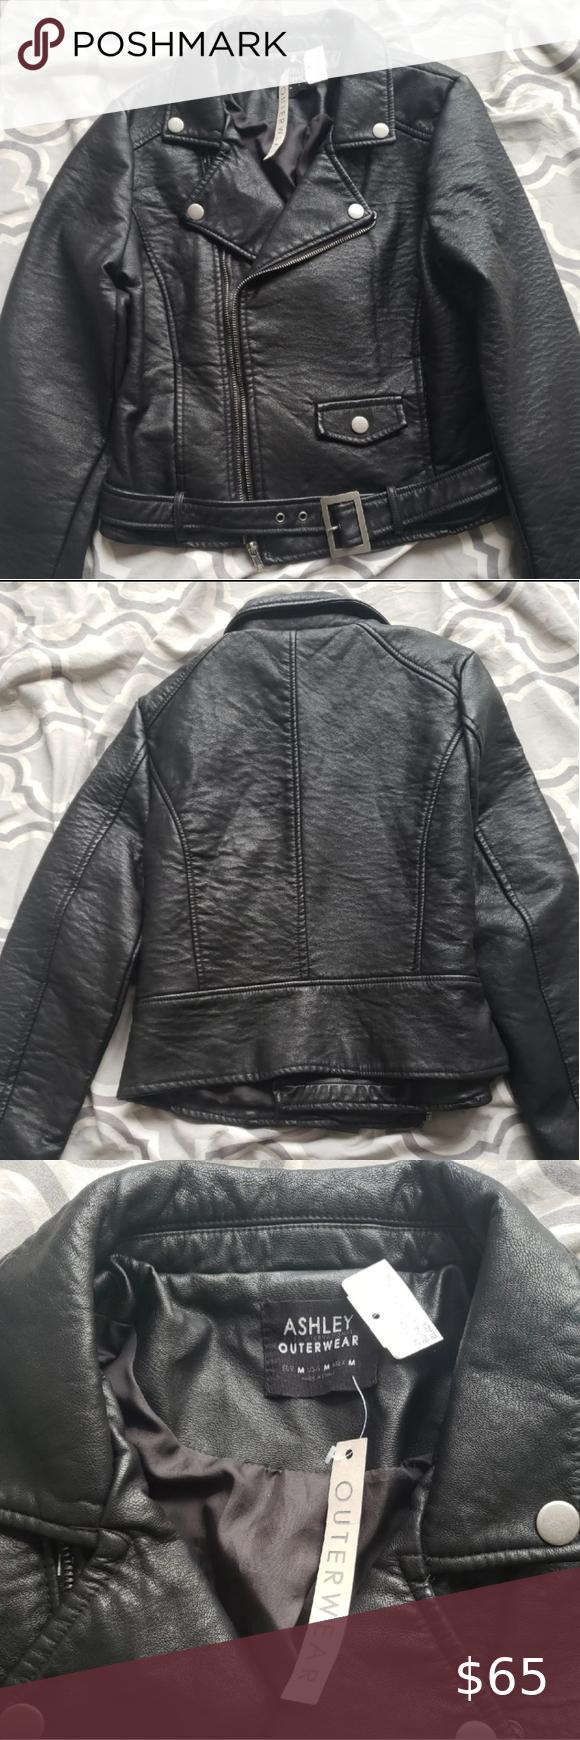 Black Faux Leather Biker Moto Jacket Faux Leather Biker Jacket Outerwear Jackets Jackets [ 1740 x 580 Pixel ]